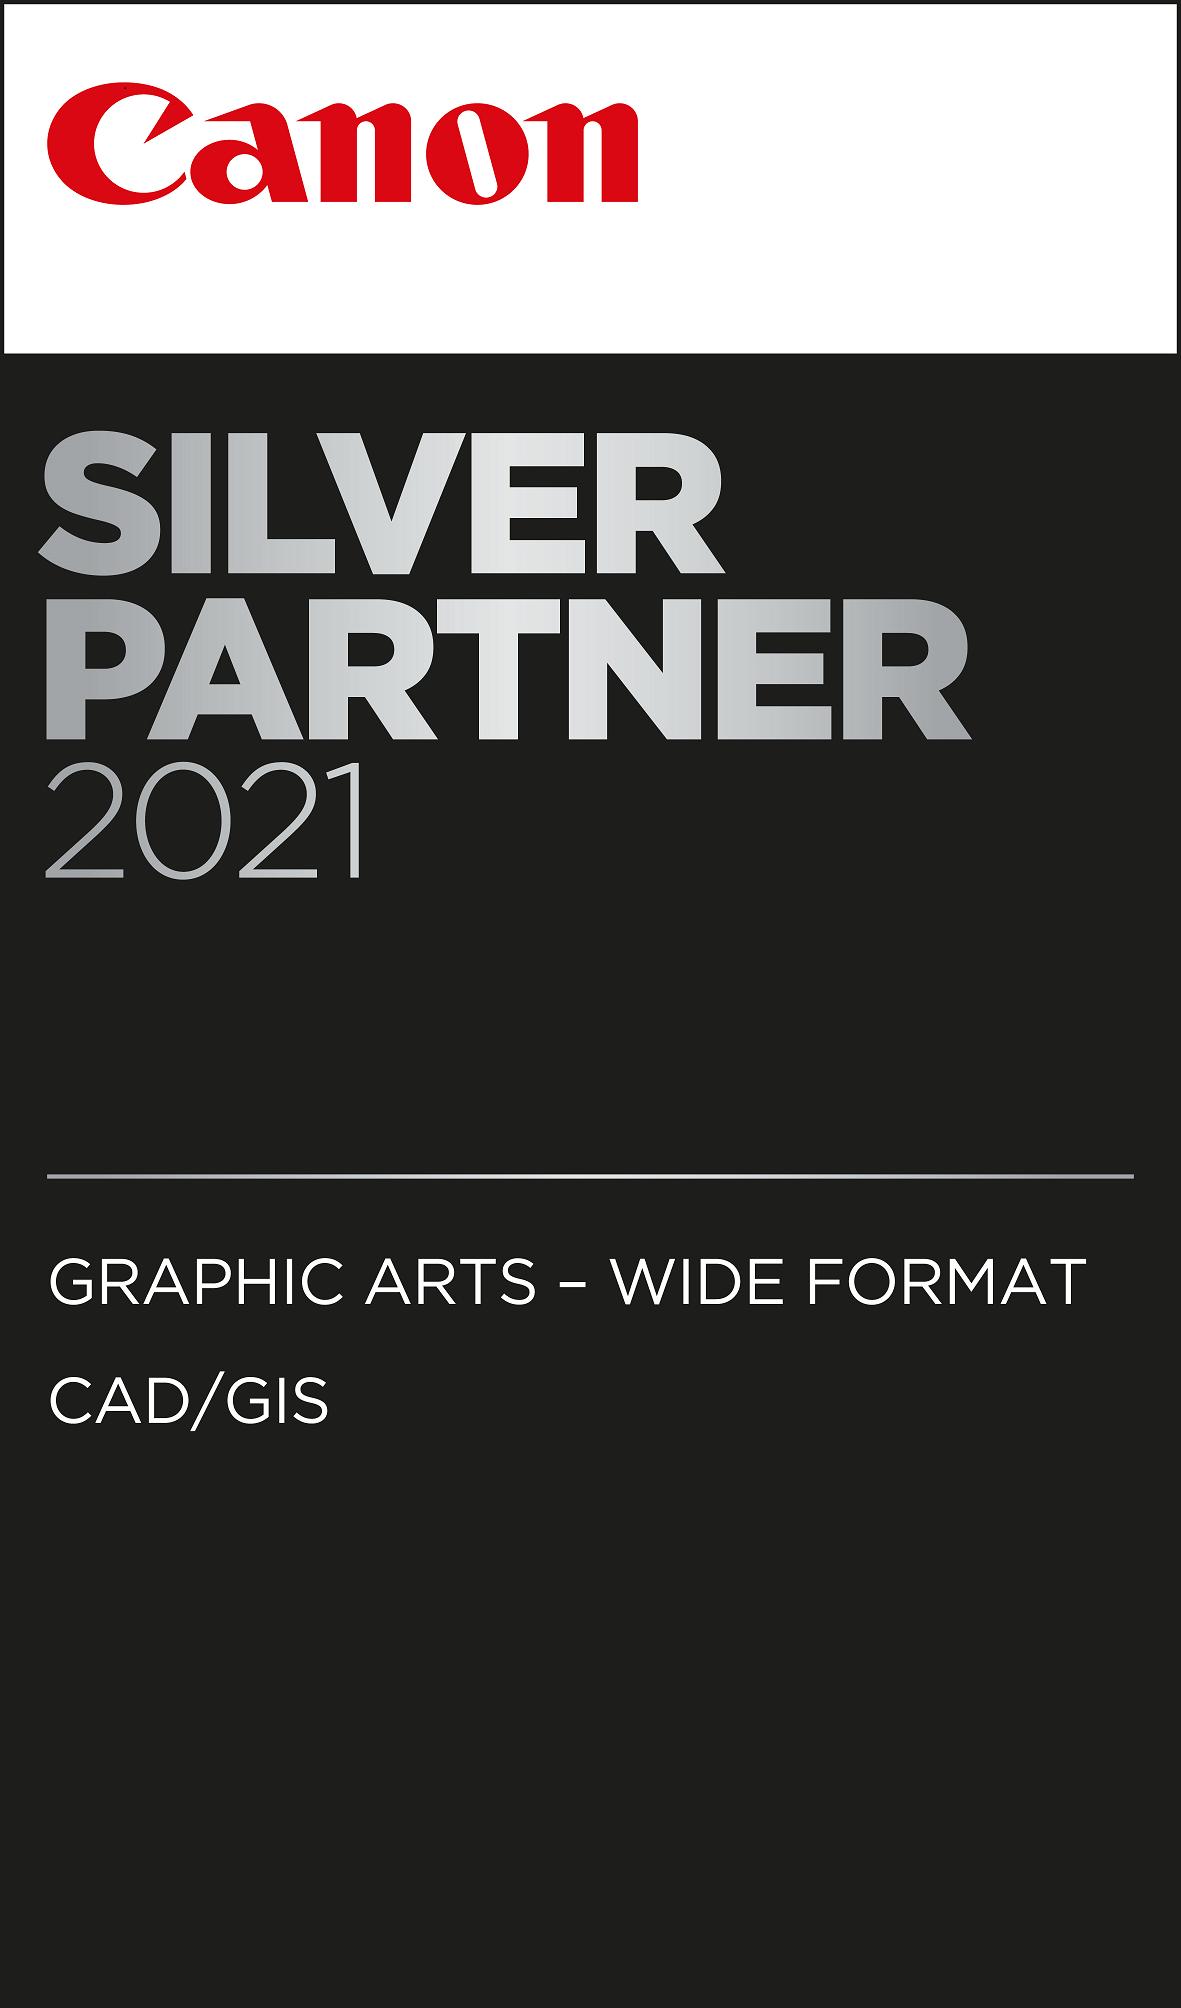 Canon Silber Partner 2021